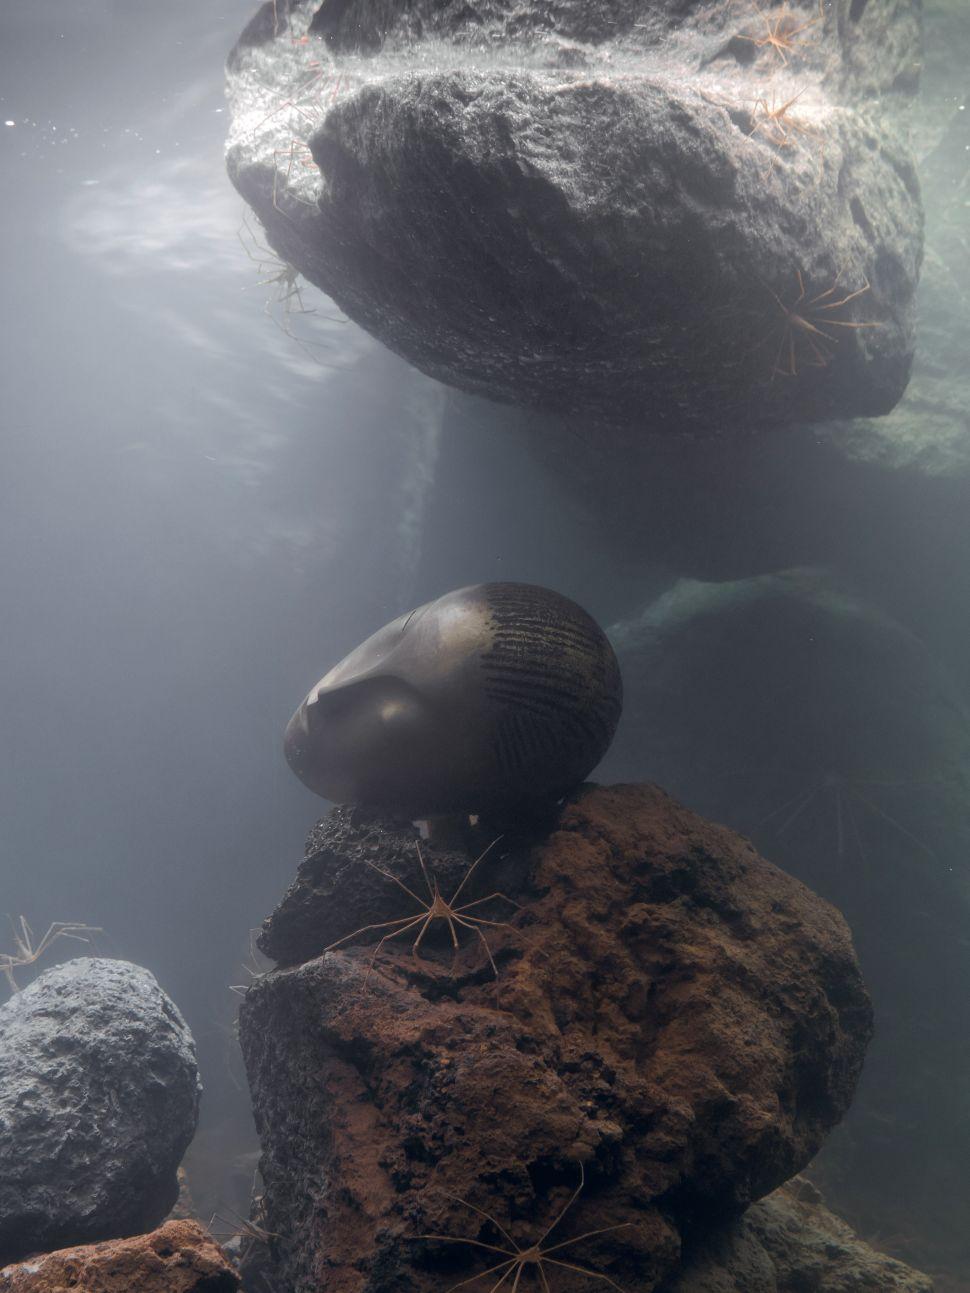 Art as Biosphere: A Walk Through Pierre Huyghe's LACMA Survey